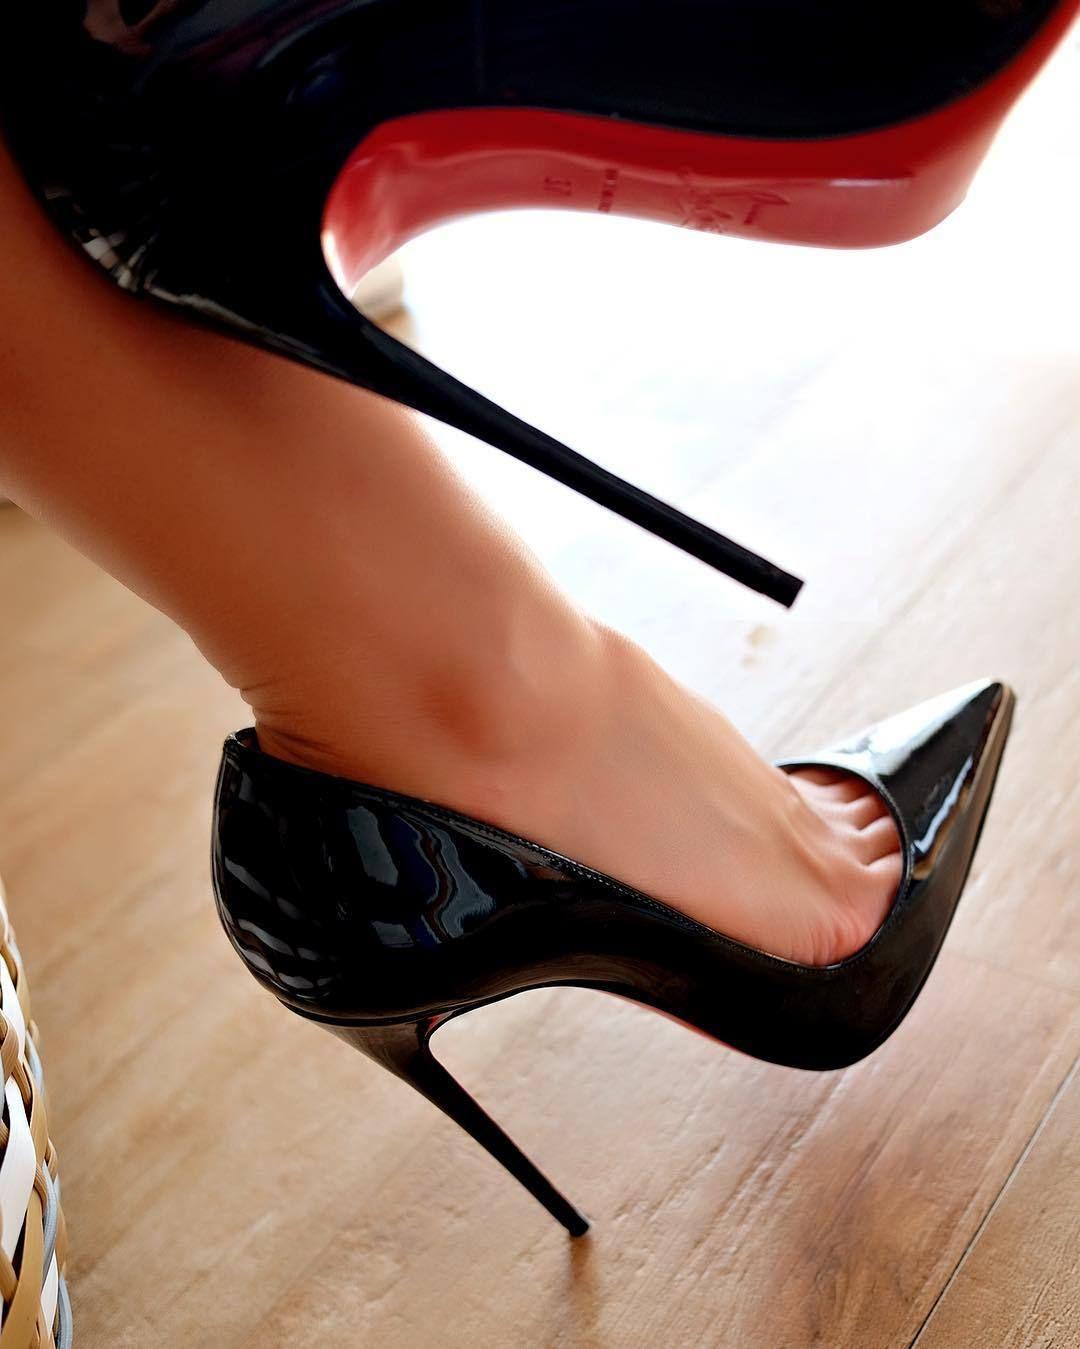 780eb81a592 High Heels & Feet | Shoes in 2019 | Pumps heels, Hot high heels ...